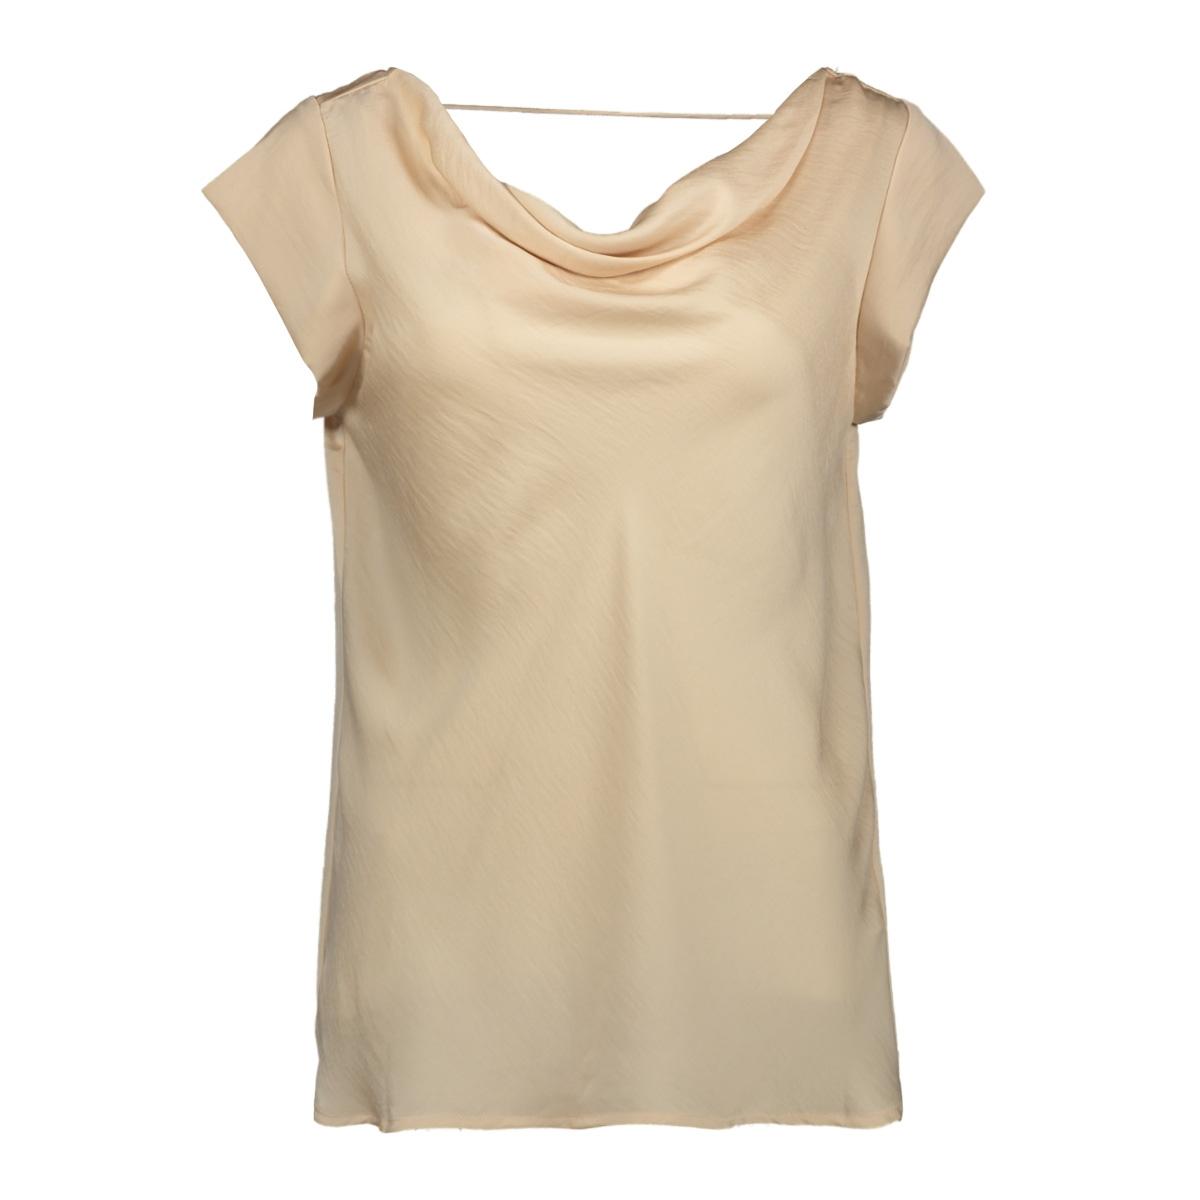 sirisz top 30500780 saint tropez blouse 141209